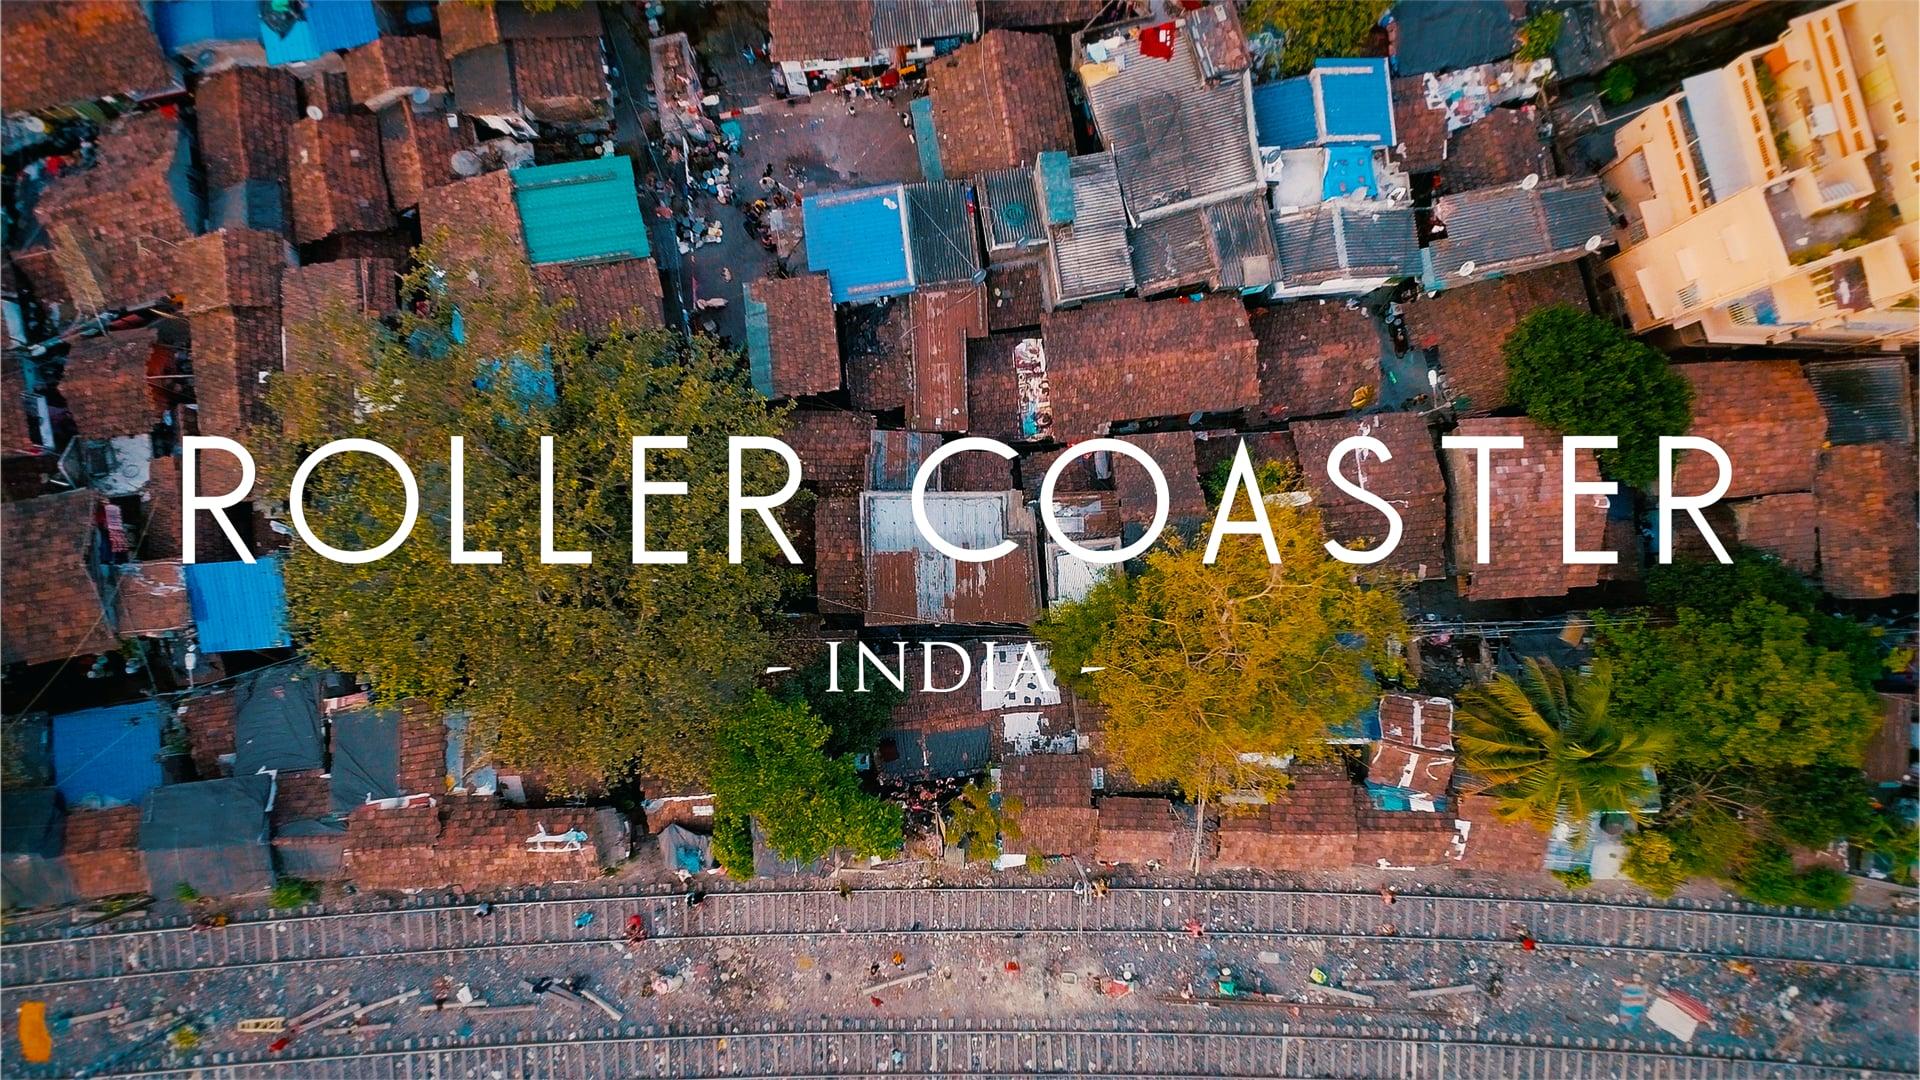 Roller Coaster India